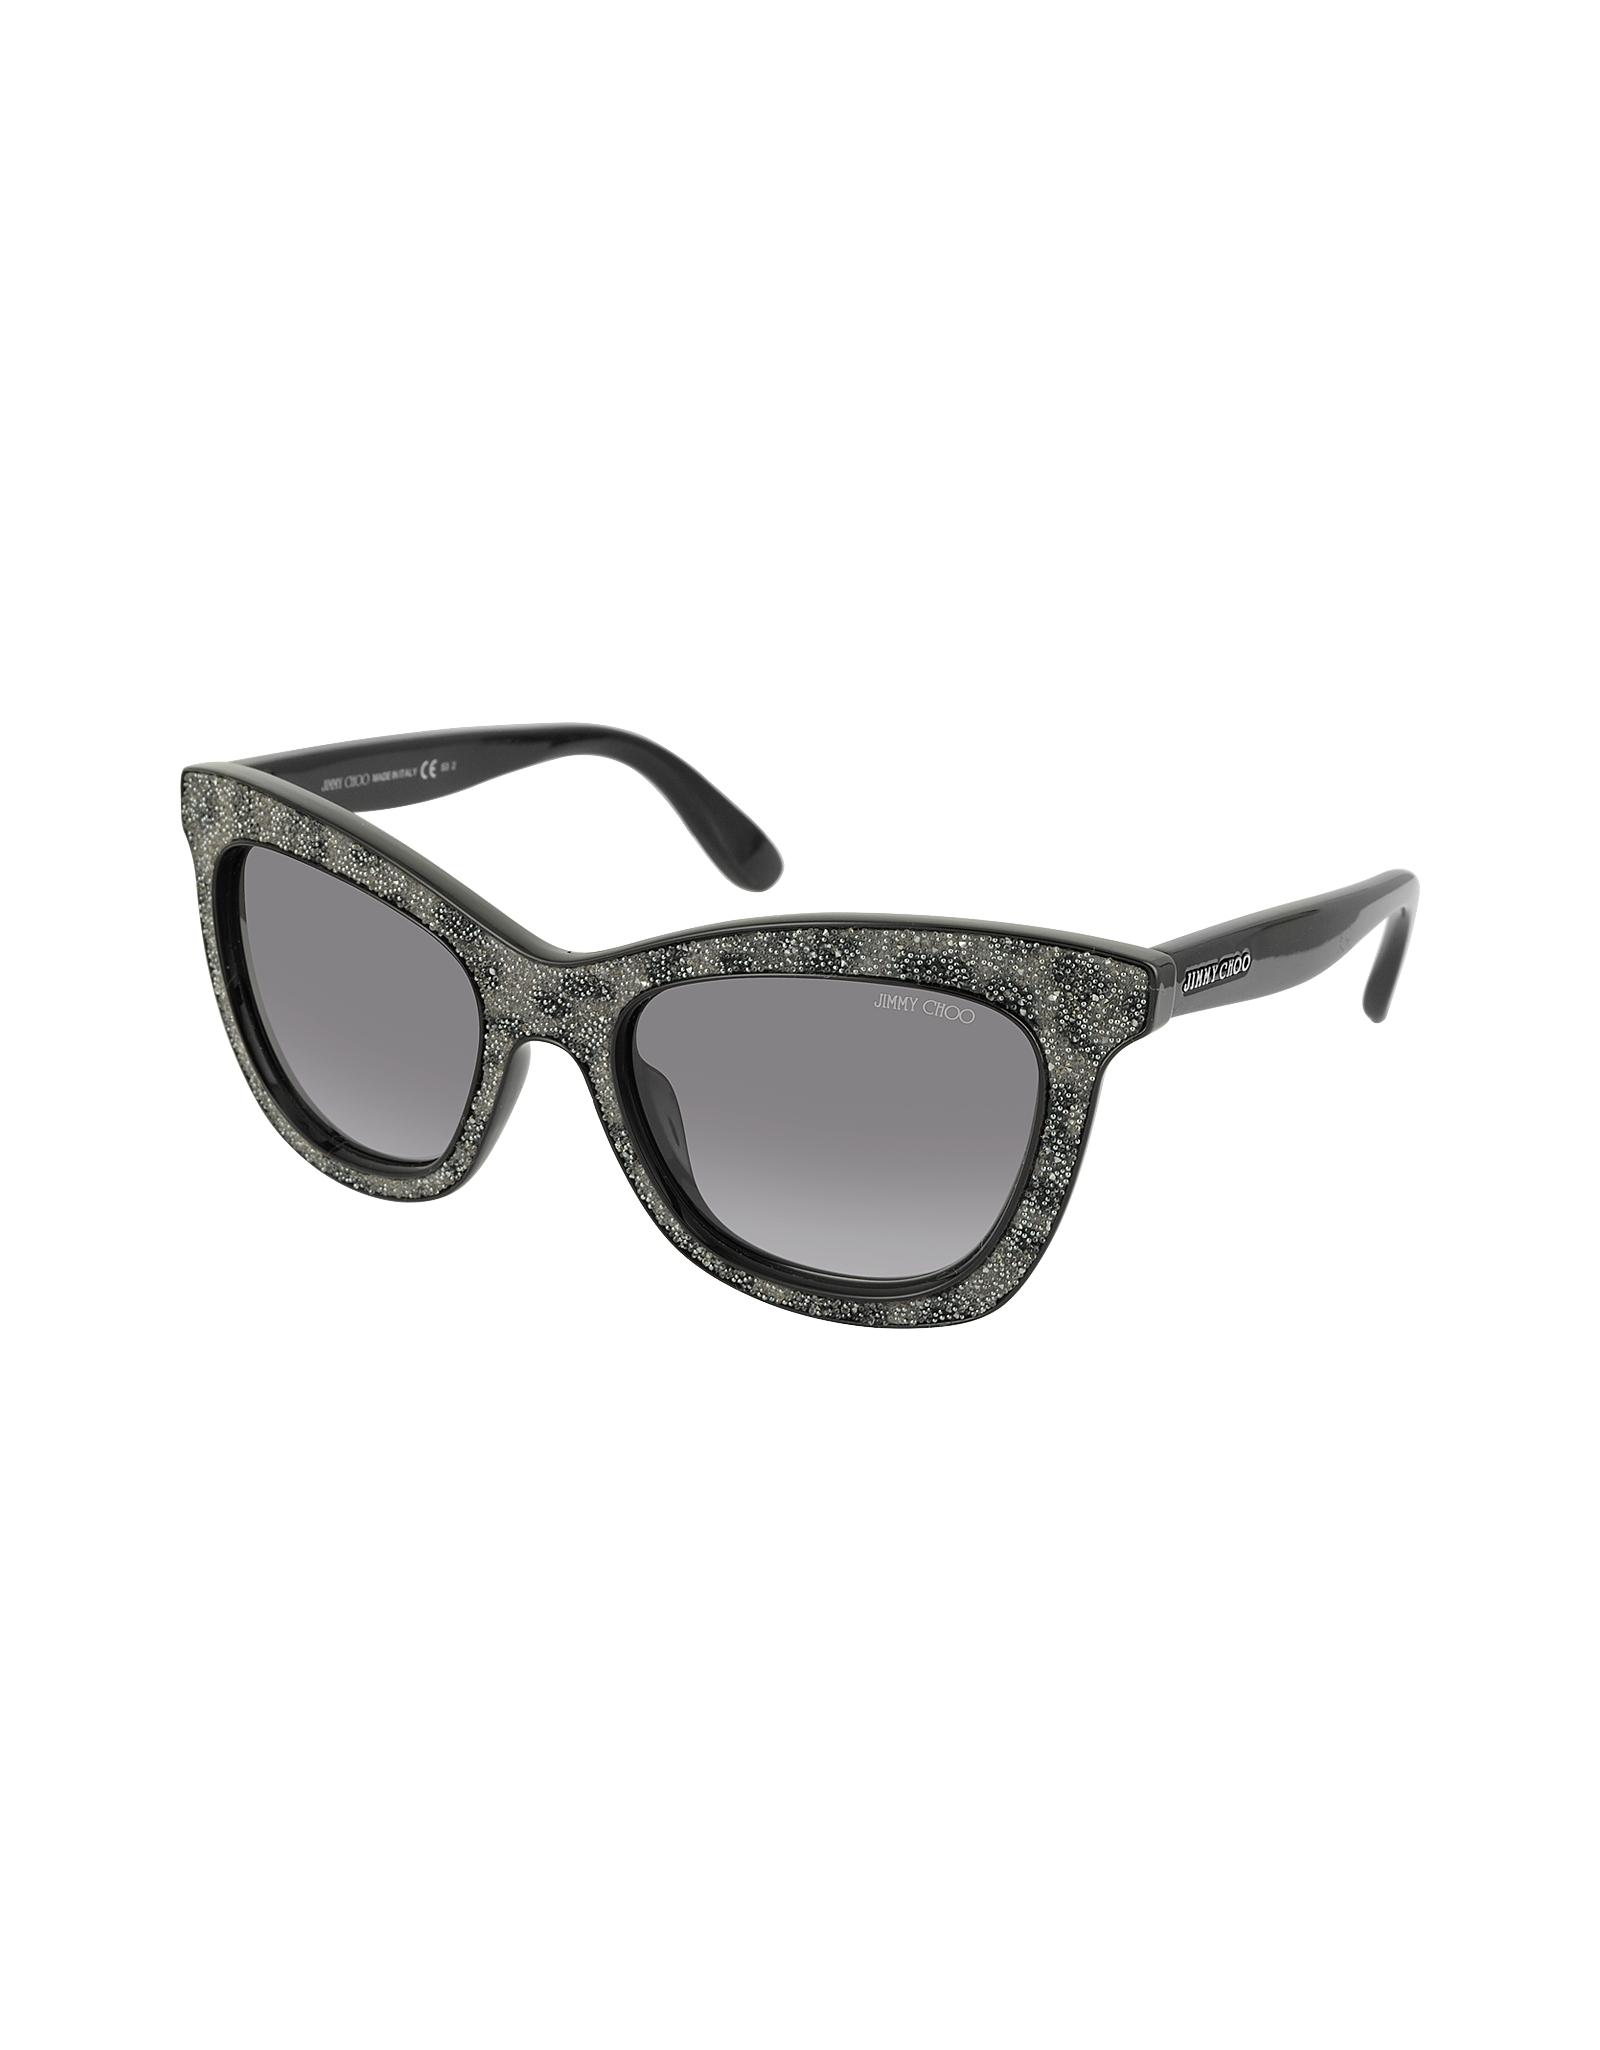 9e5c77835680 Jimmy Choo Flash/s Ibweu Black & Grey Glitter Cat Eye Sunglasses in ...